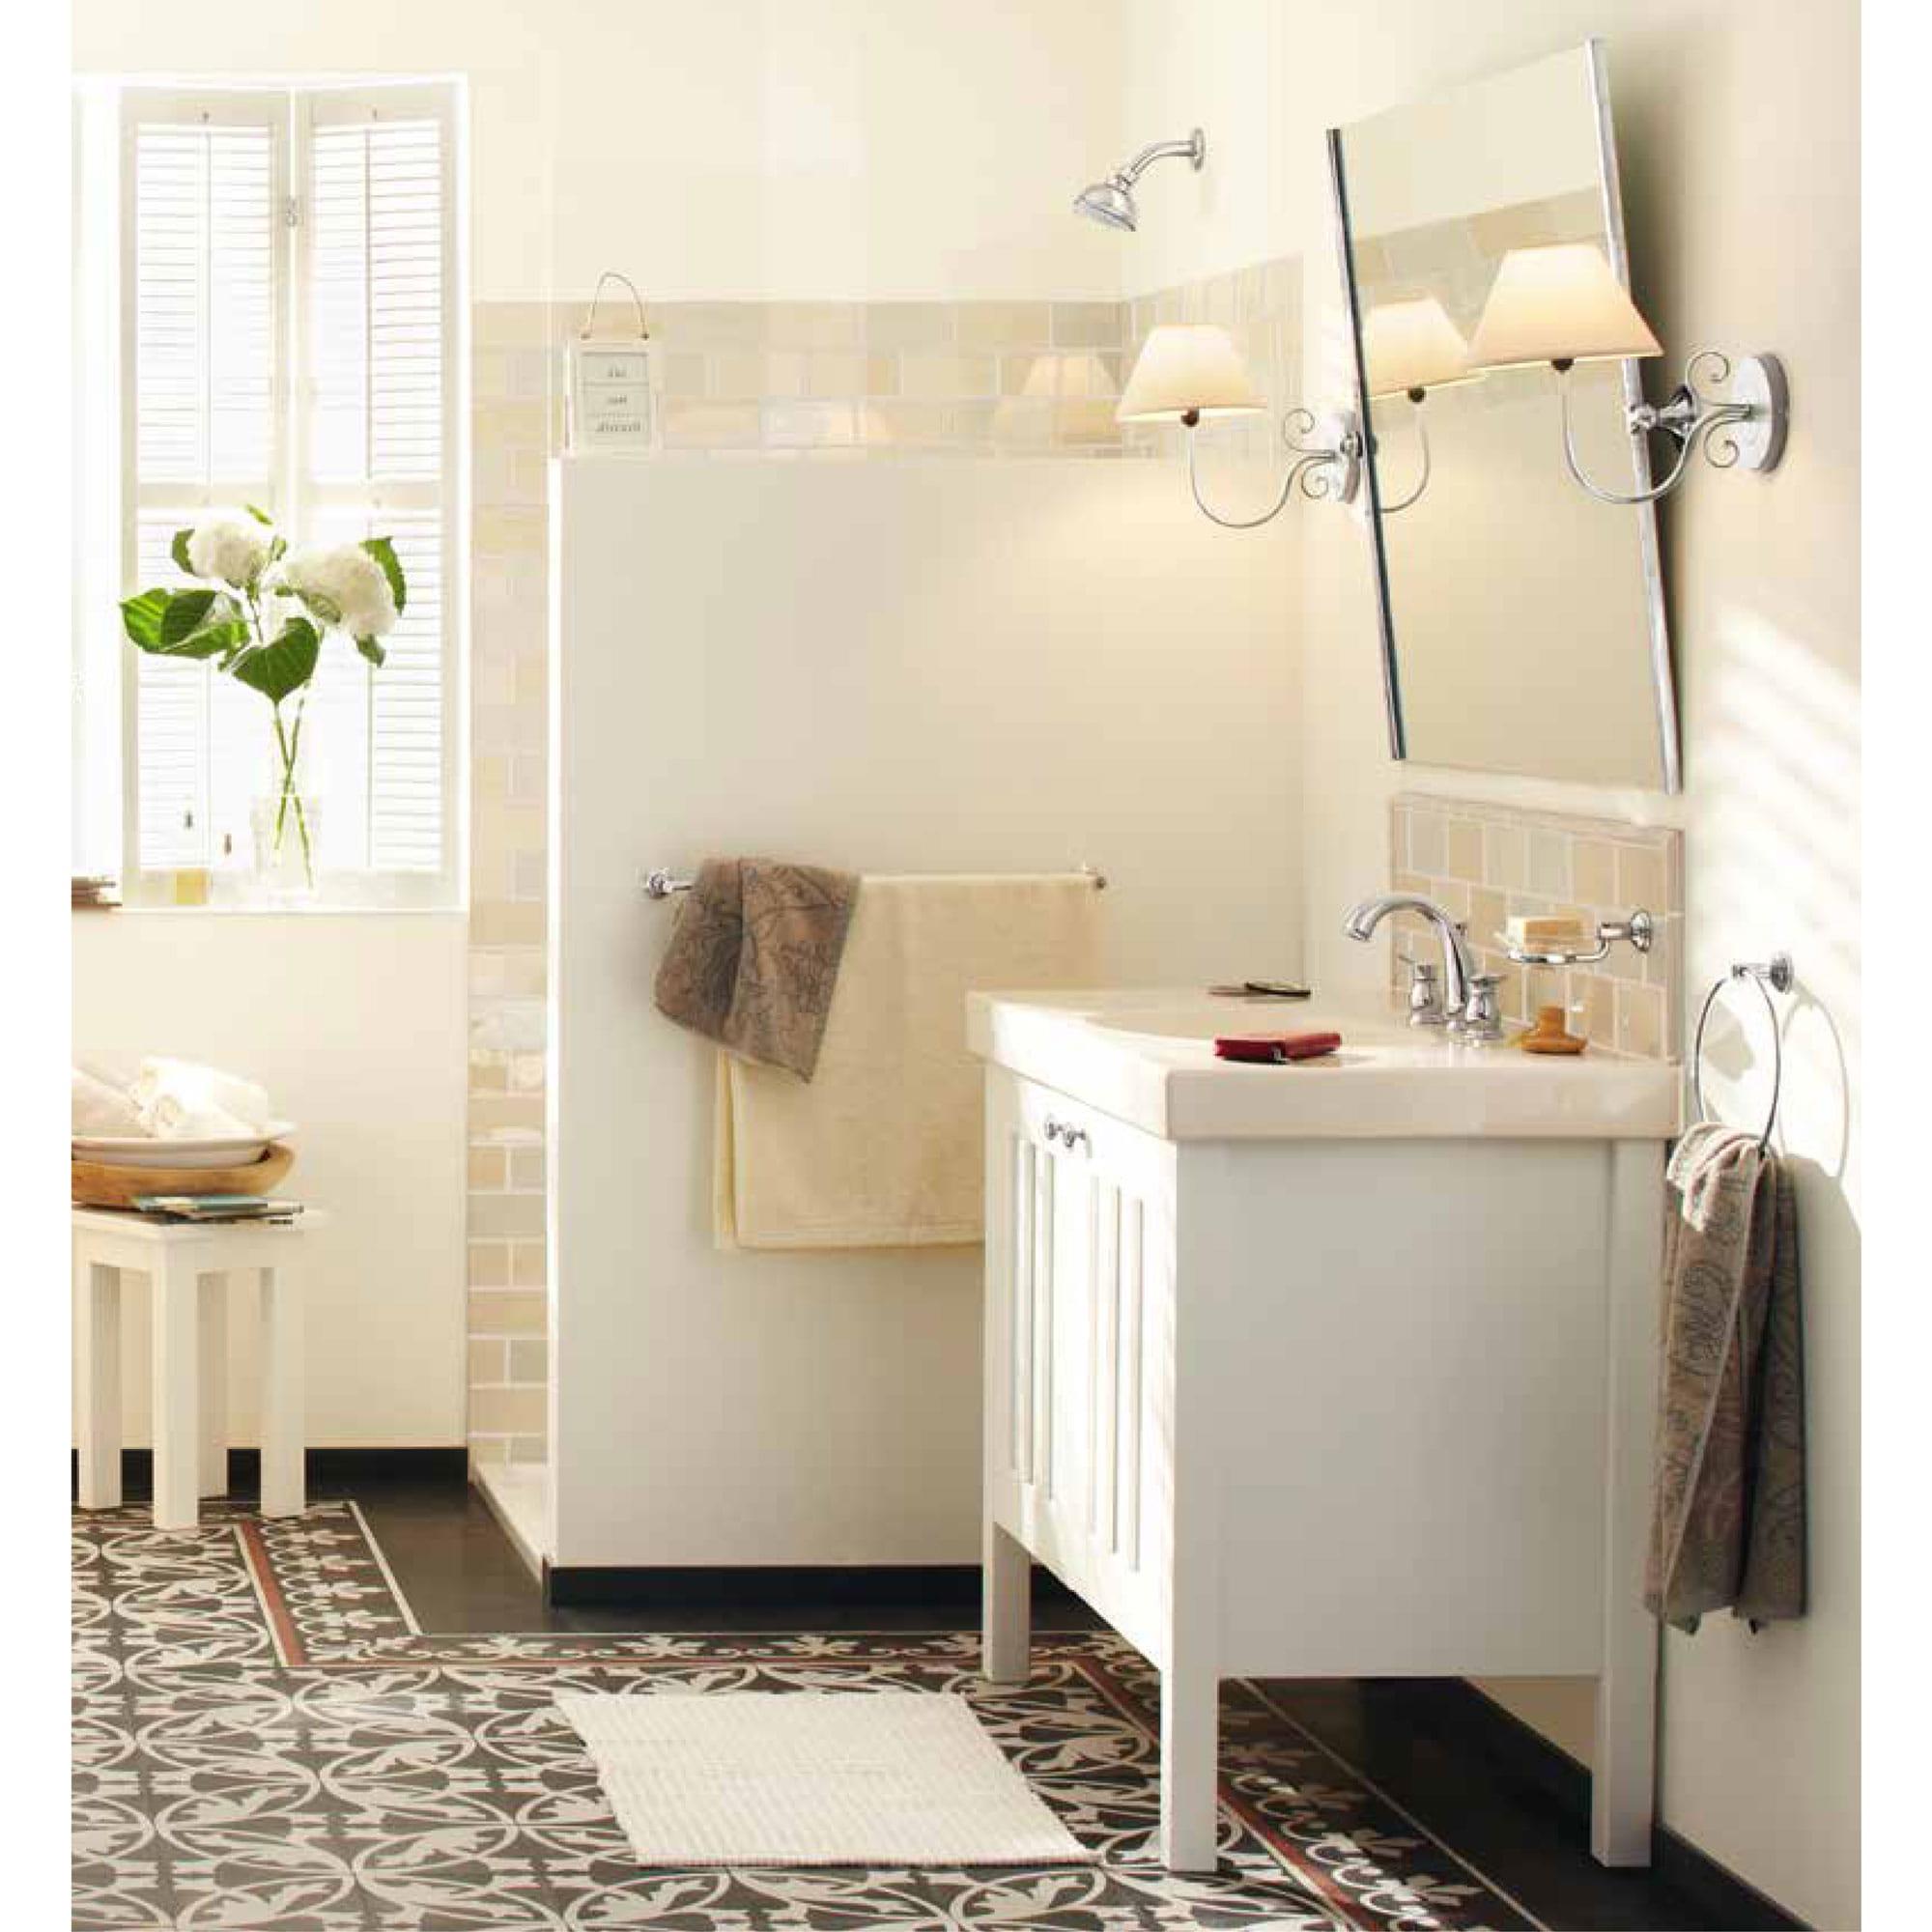 cream theme bathroom with white sink